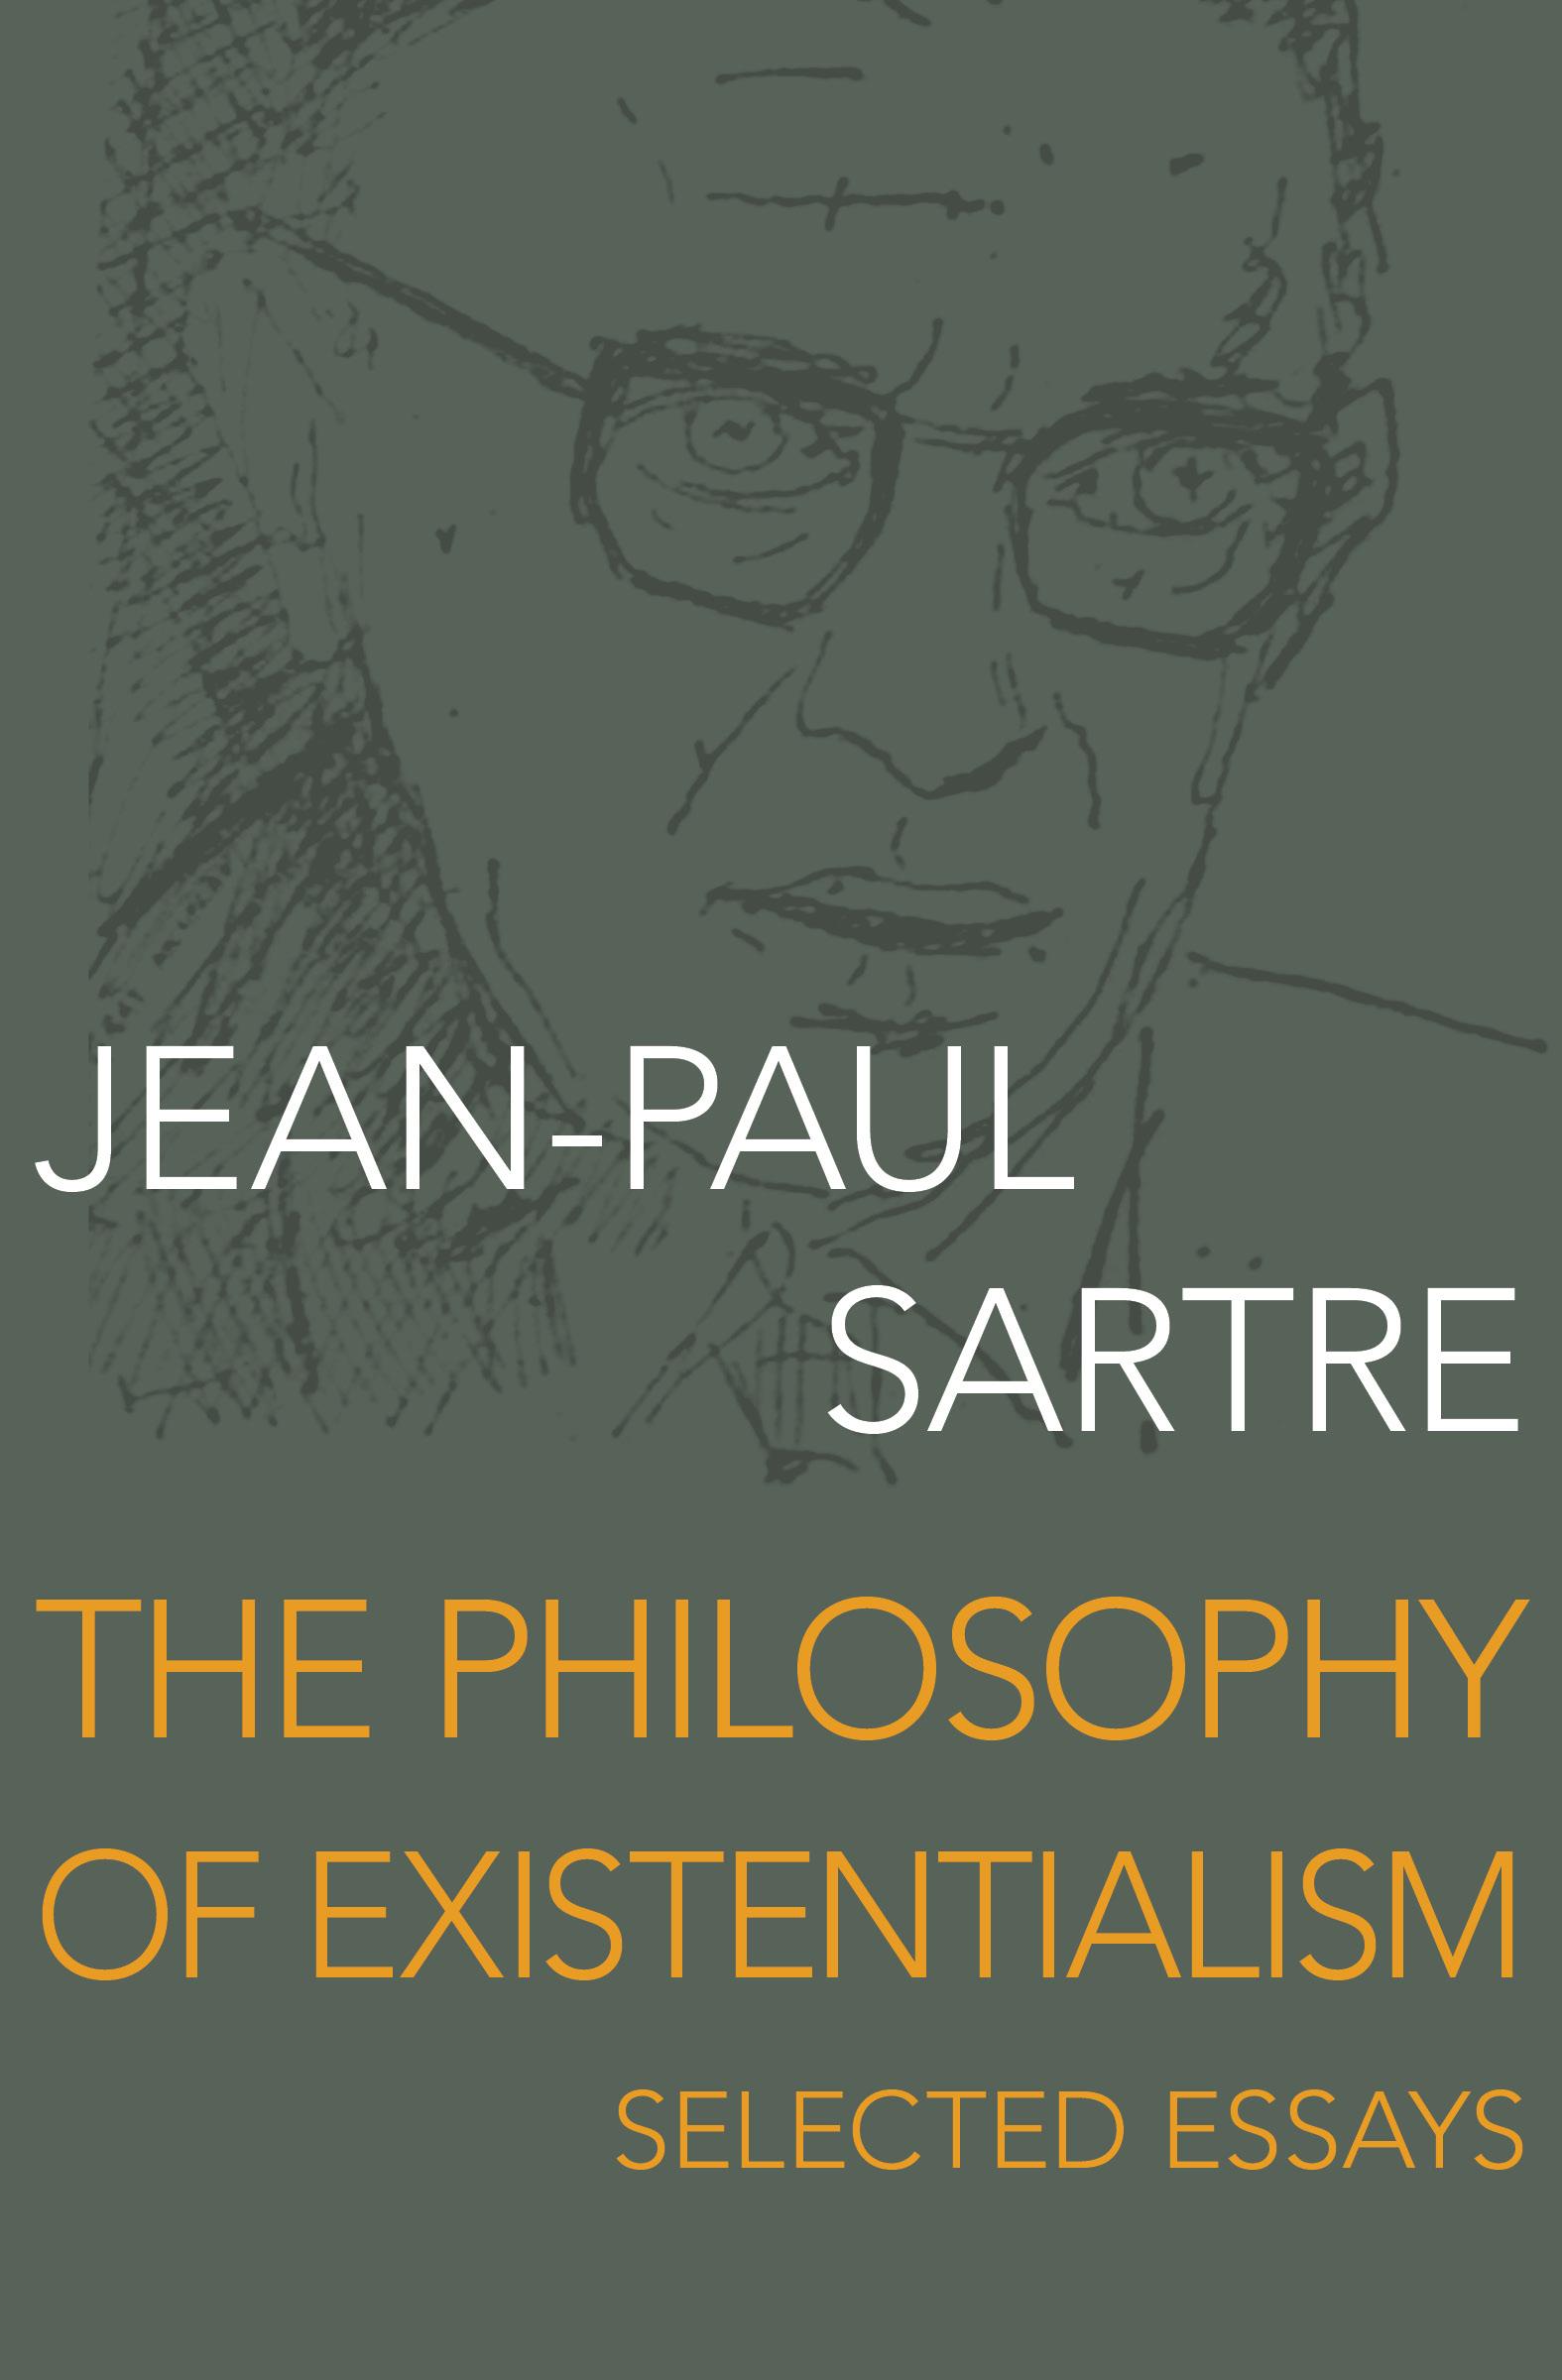 sartre jean-paul essays on existentialism citadel press